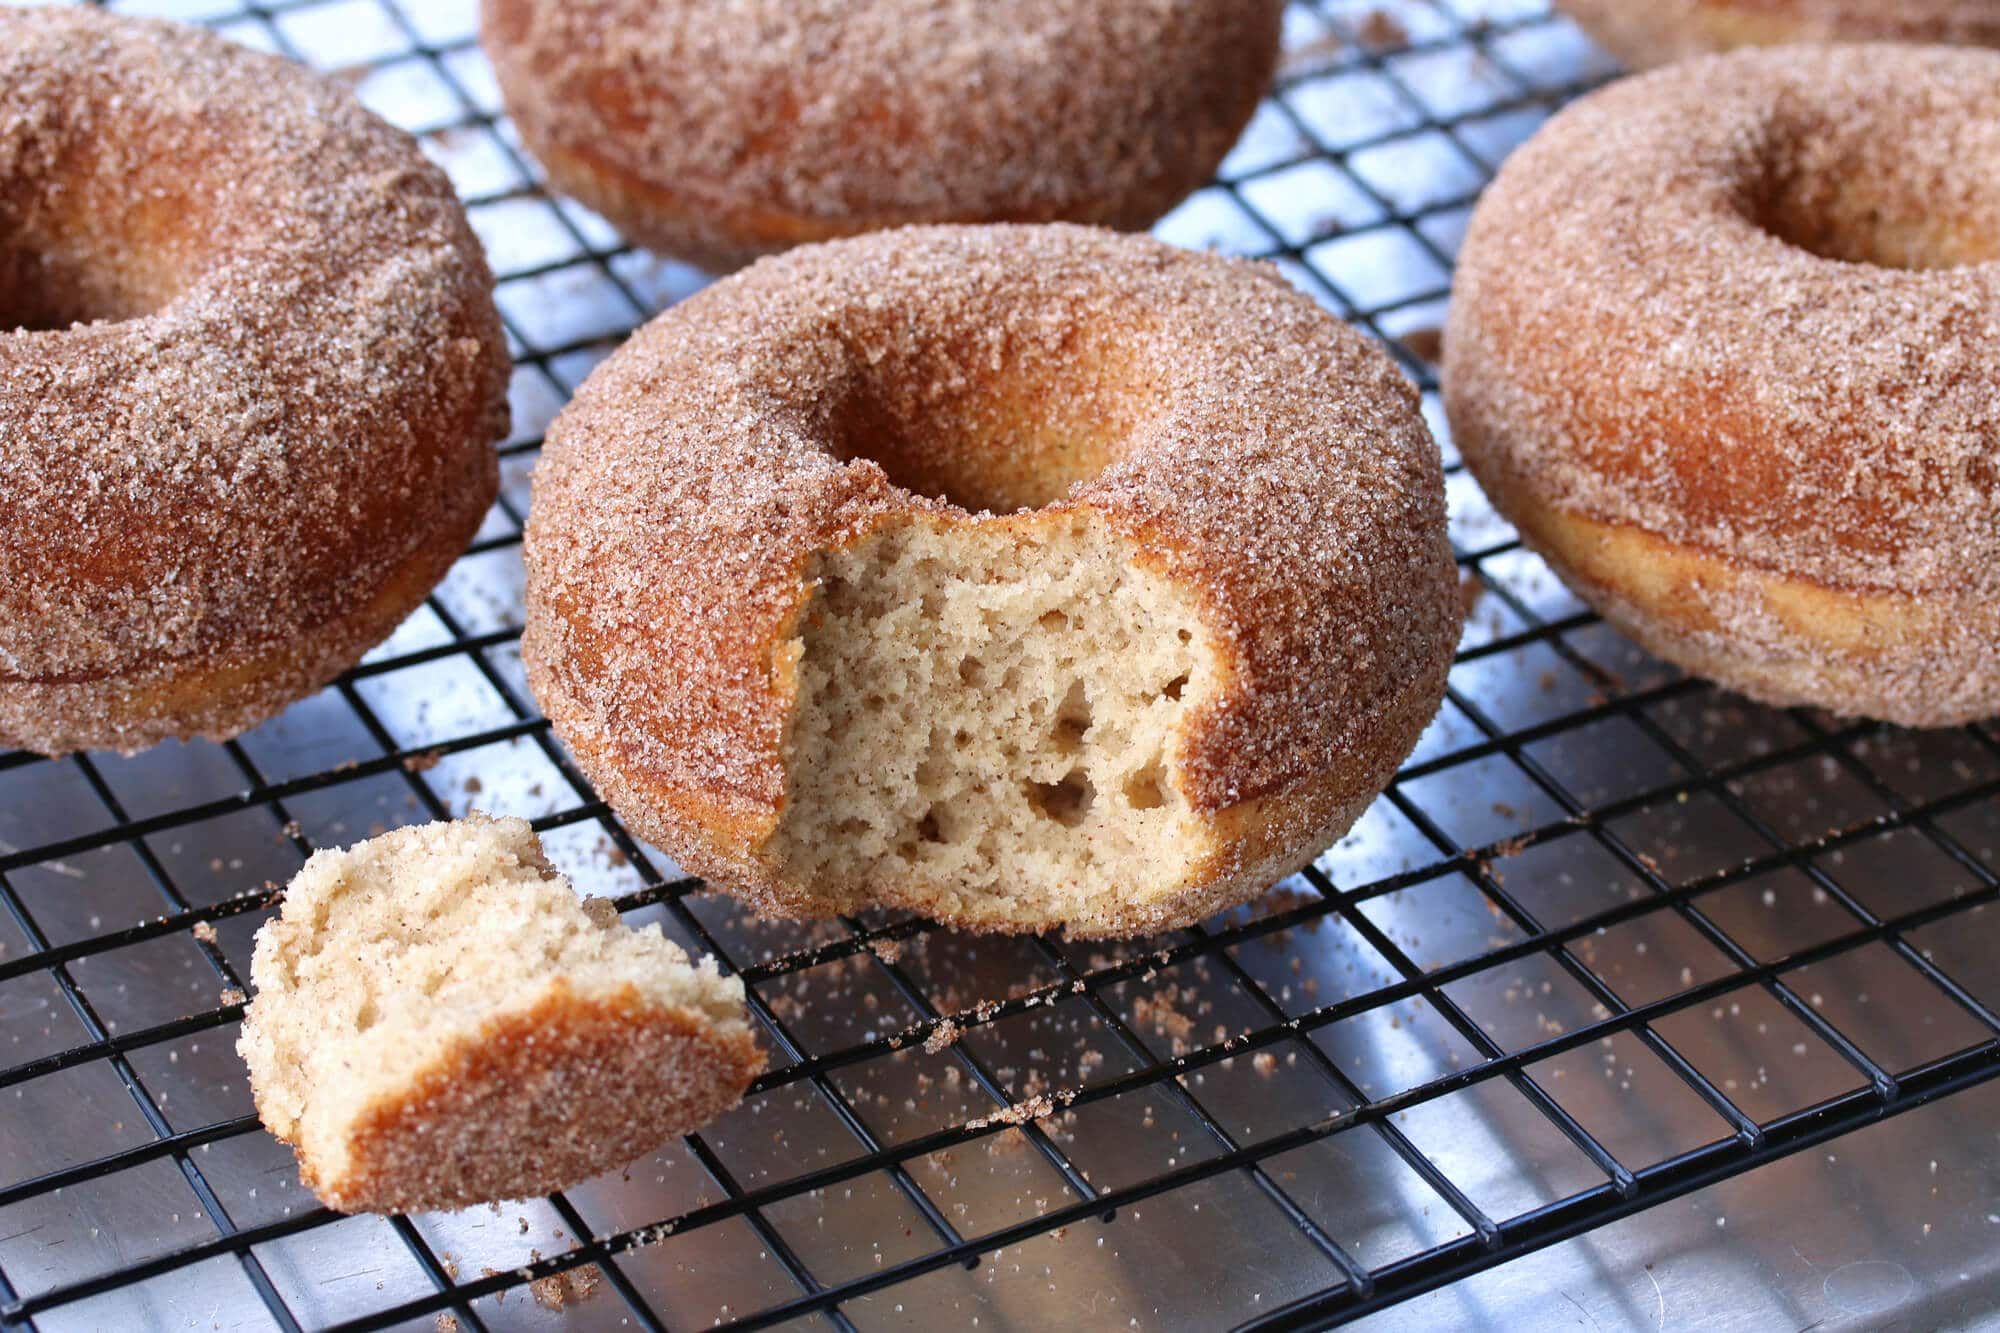 gluten free cinnamon sugar donuts doughnuts recipe baked oven